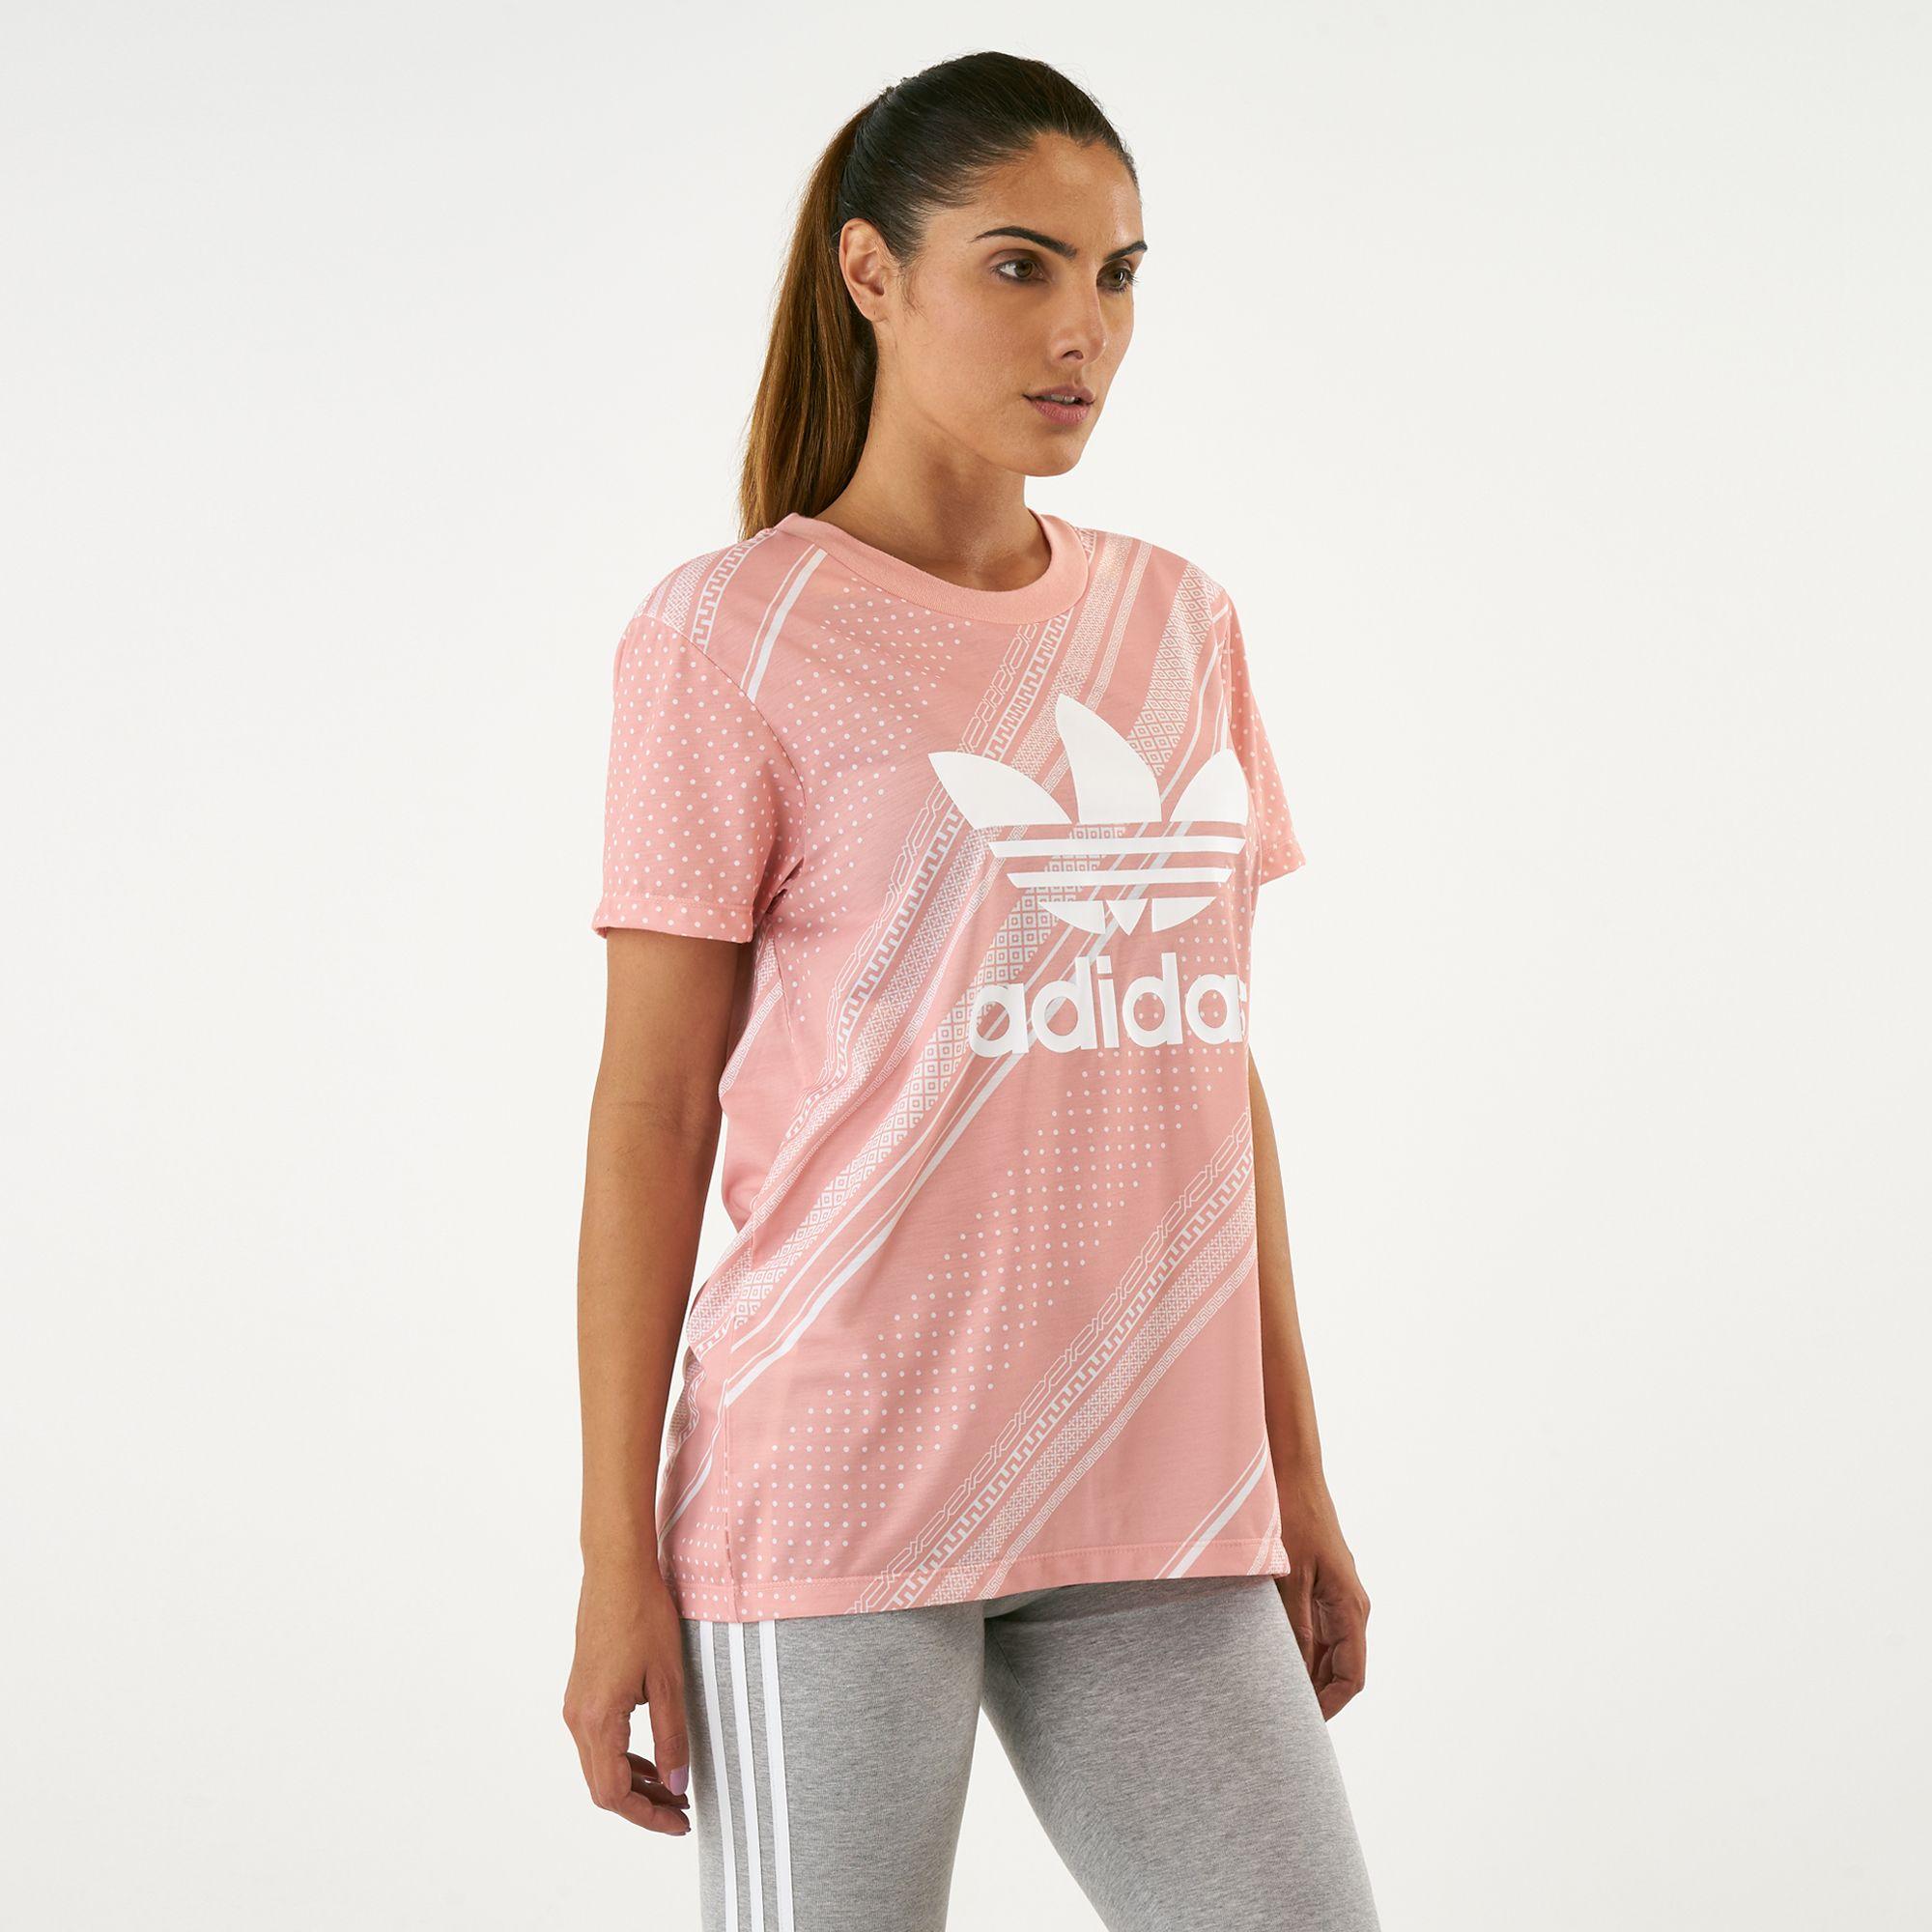 32bbc943 adidas Originals Women's Boyfriend Trefoil T-Shirt | T-Shirts | Tops ...